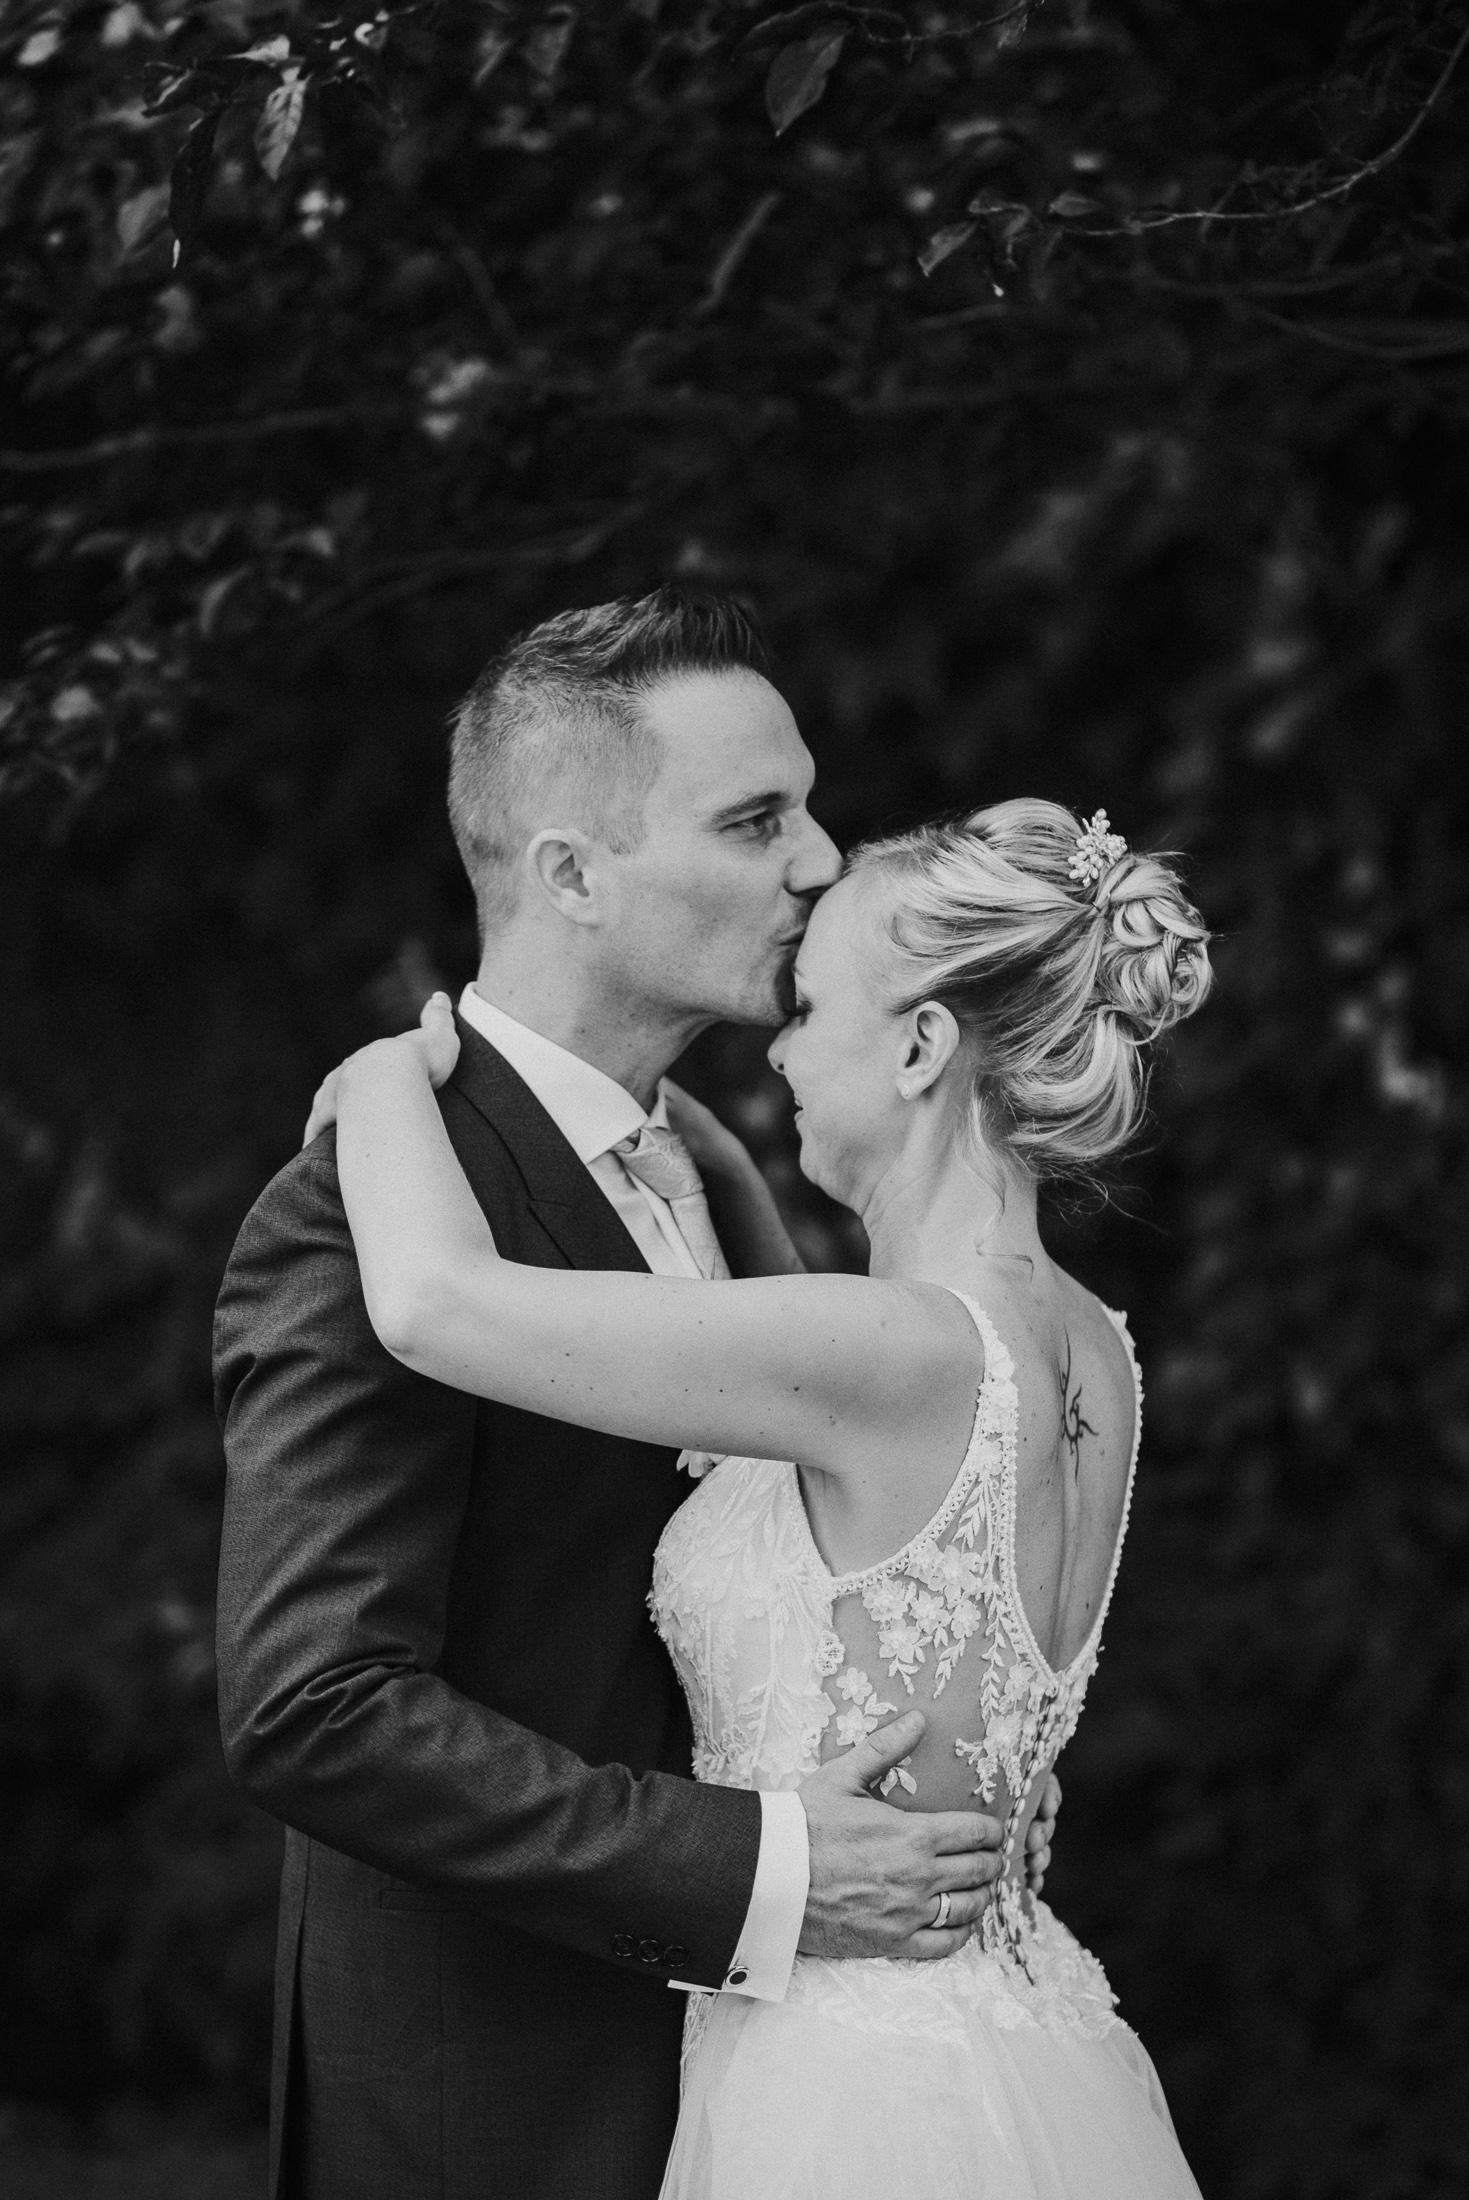 SebastianDon-Hochzeitsfotograf-Wien Umgebung-32.jpg